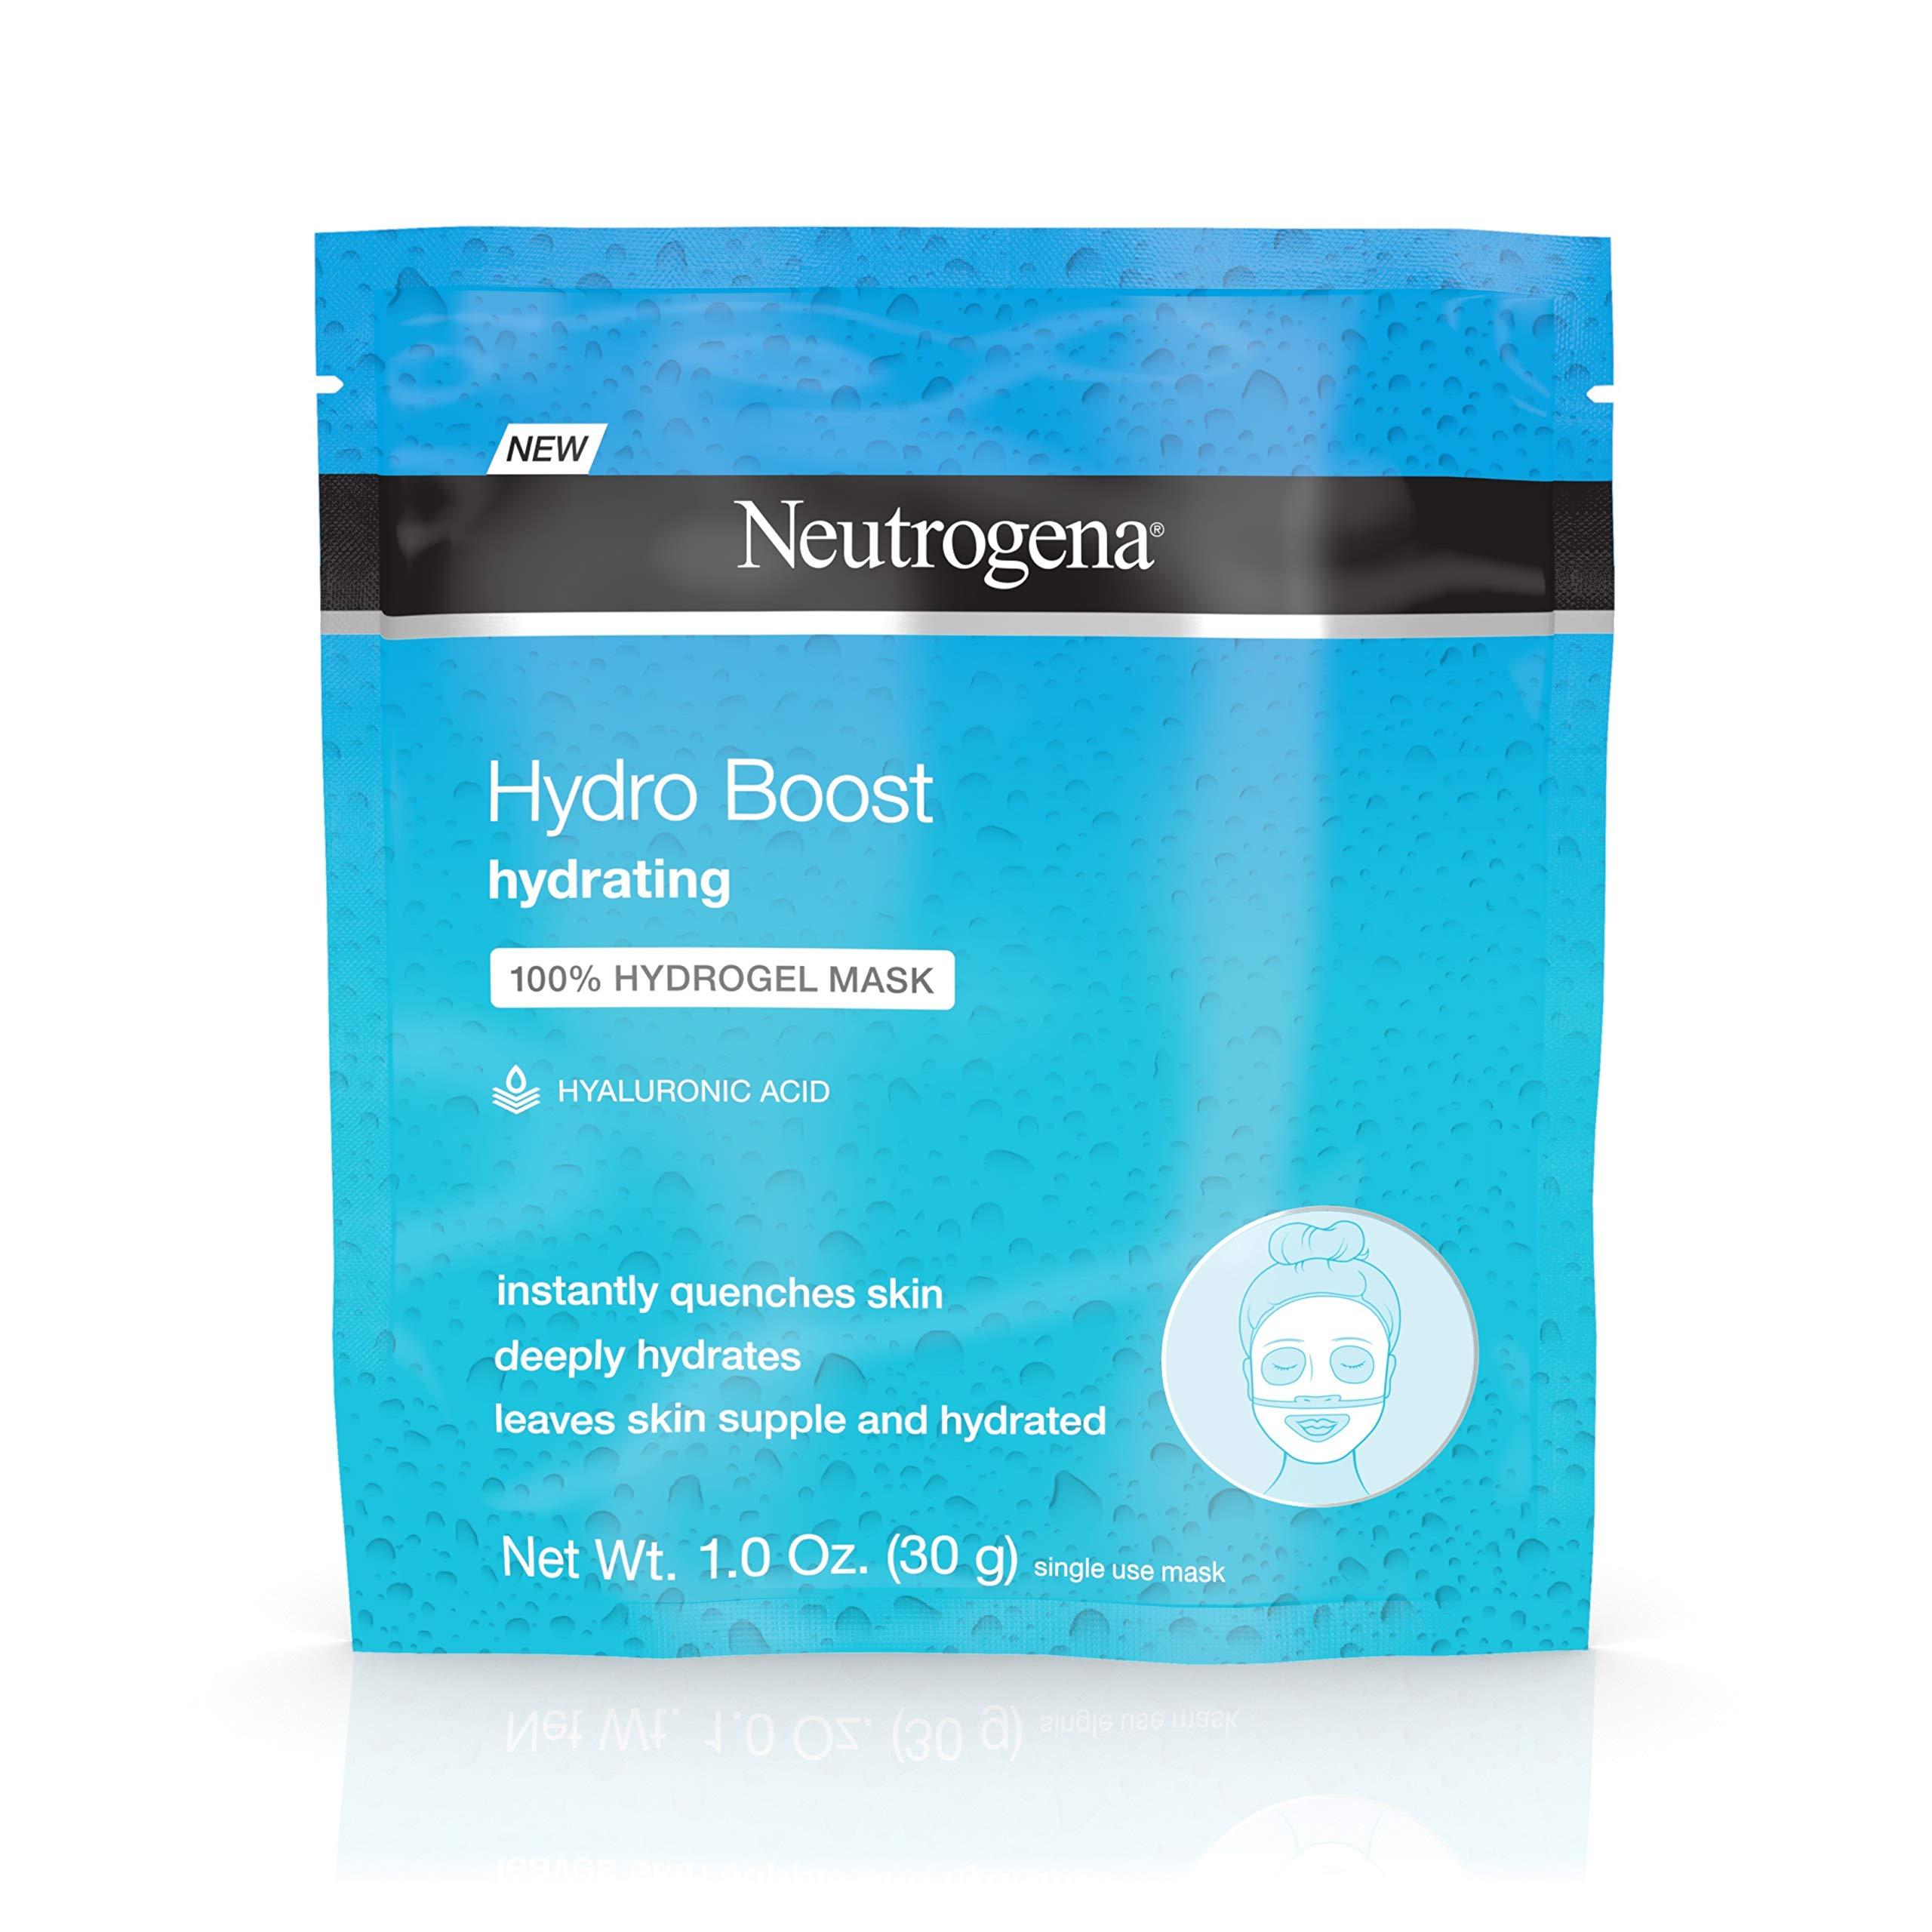 Neutrogena Hydro Boost Hydrating Hydrogel Mask, 1 Single Use Mask